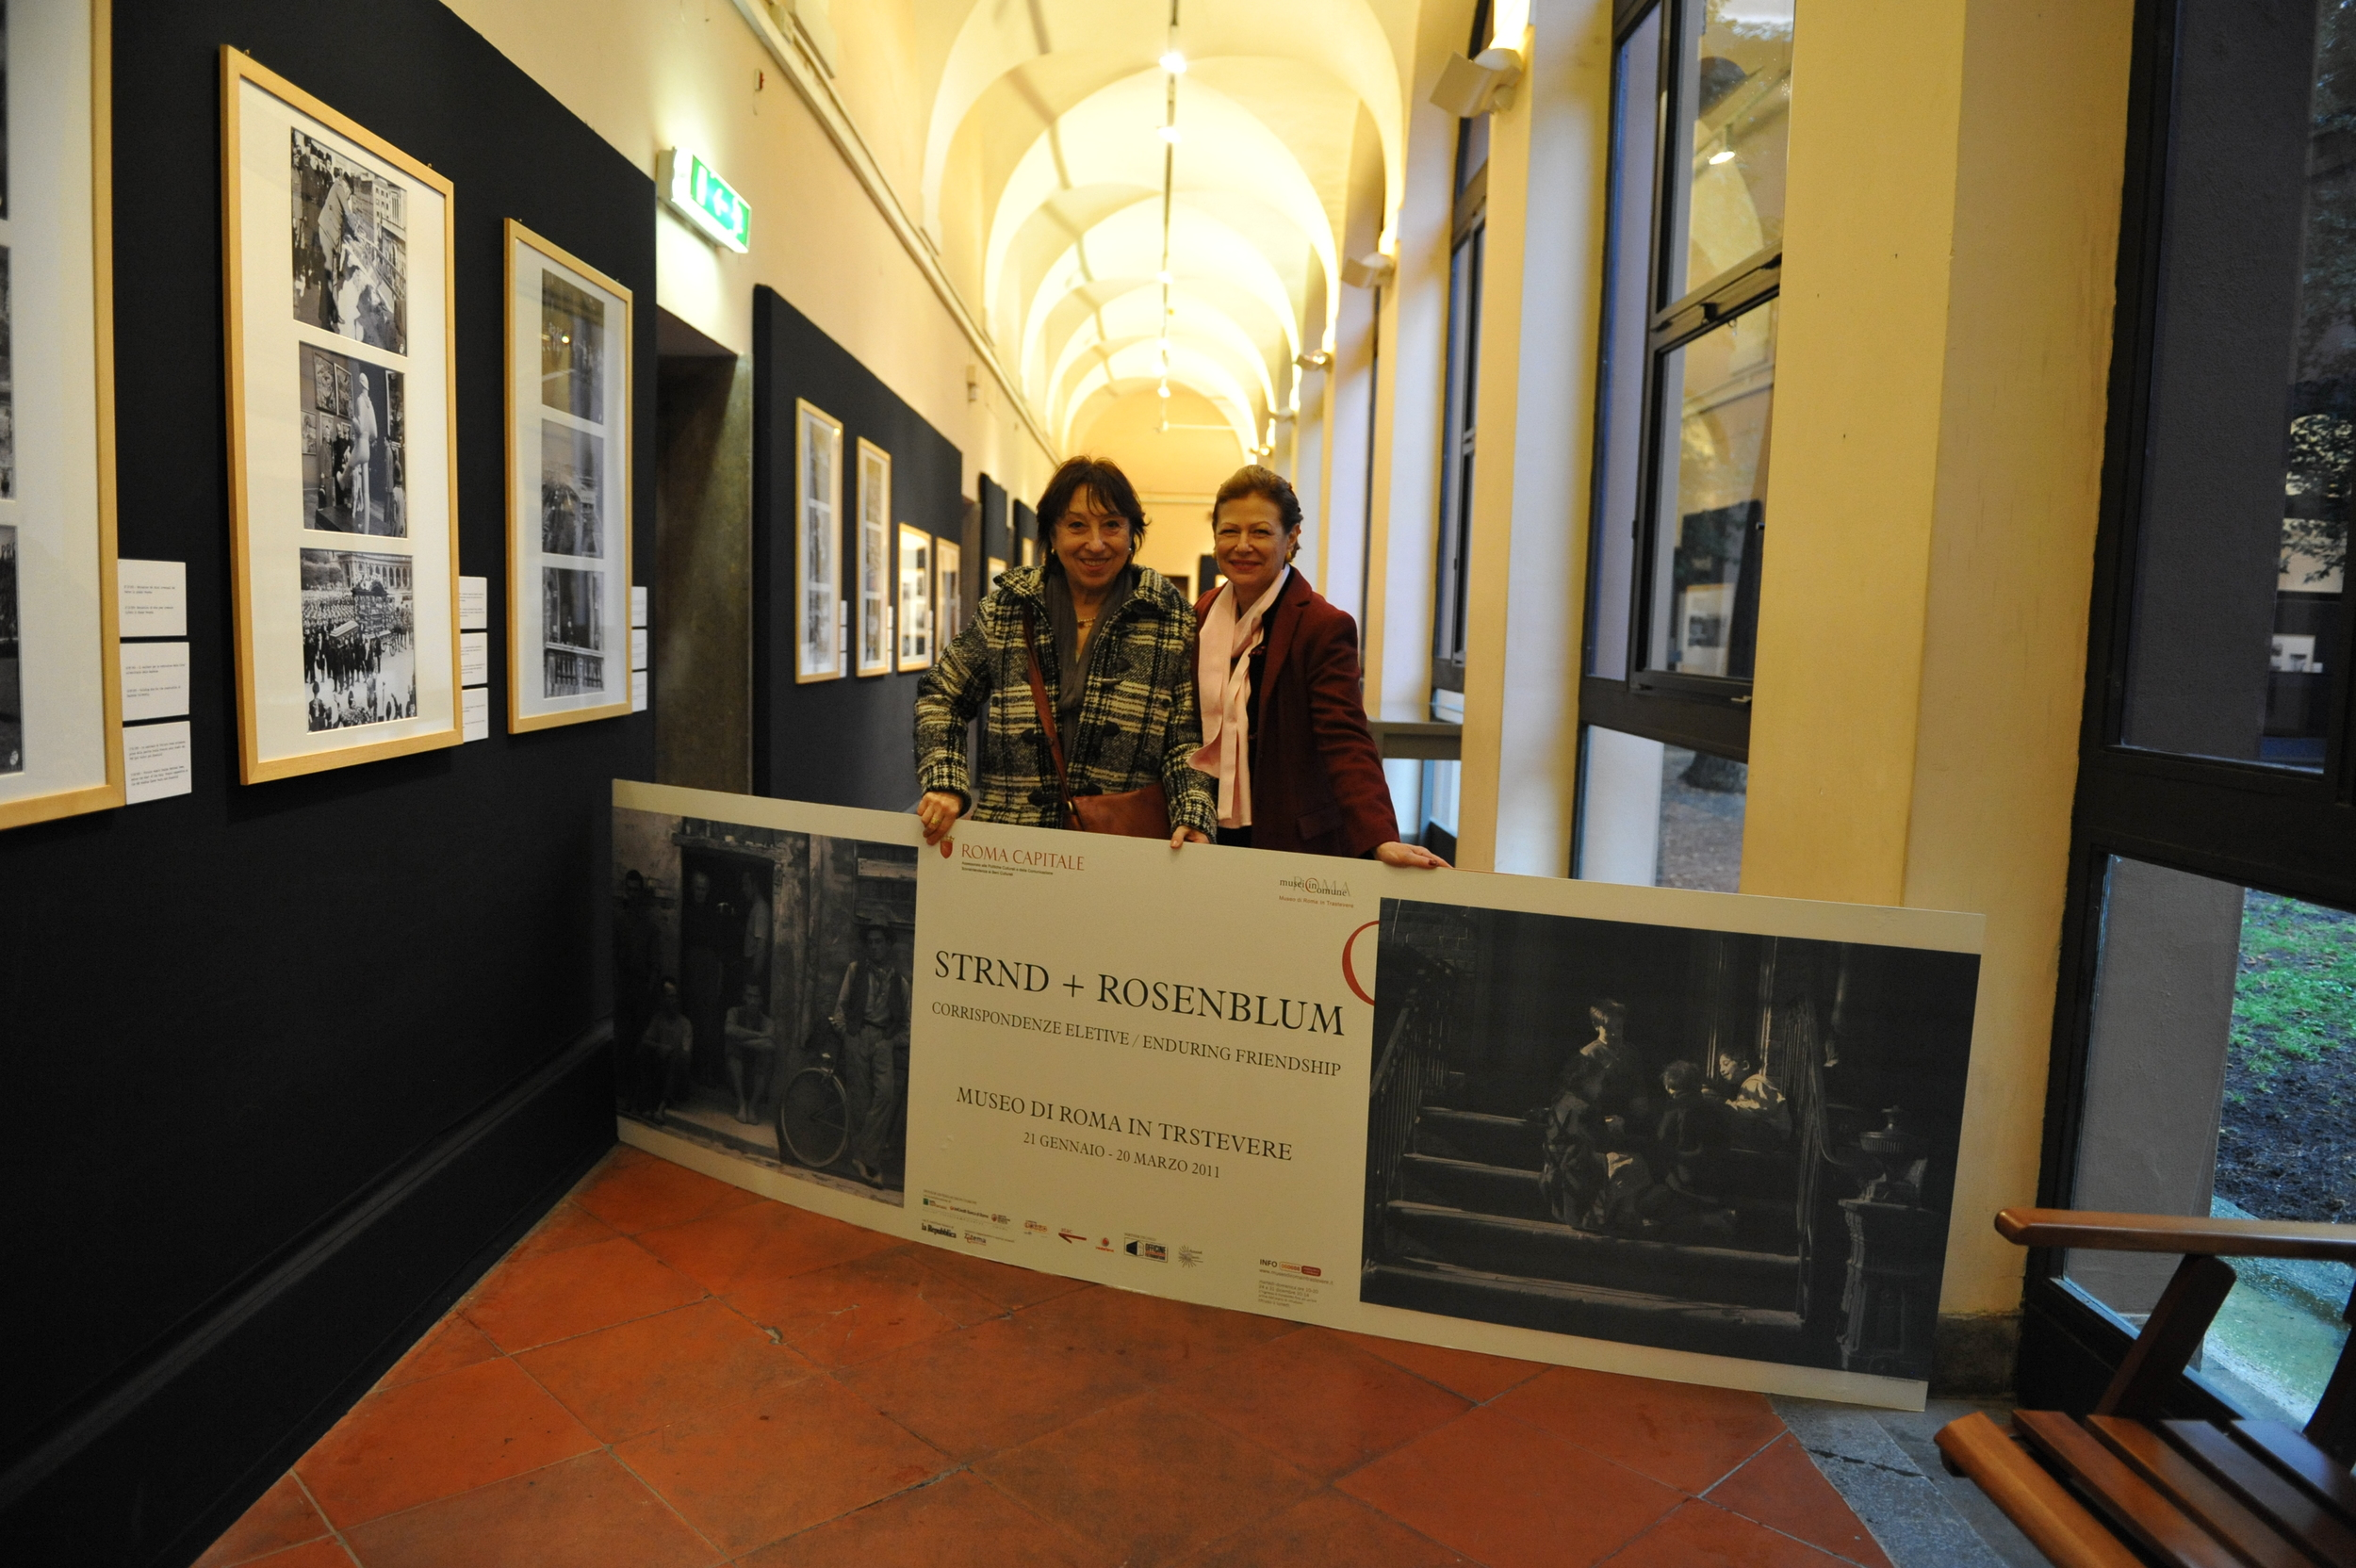 Nina Rosenblum with Curator Maria Paola Fornasiero